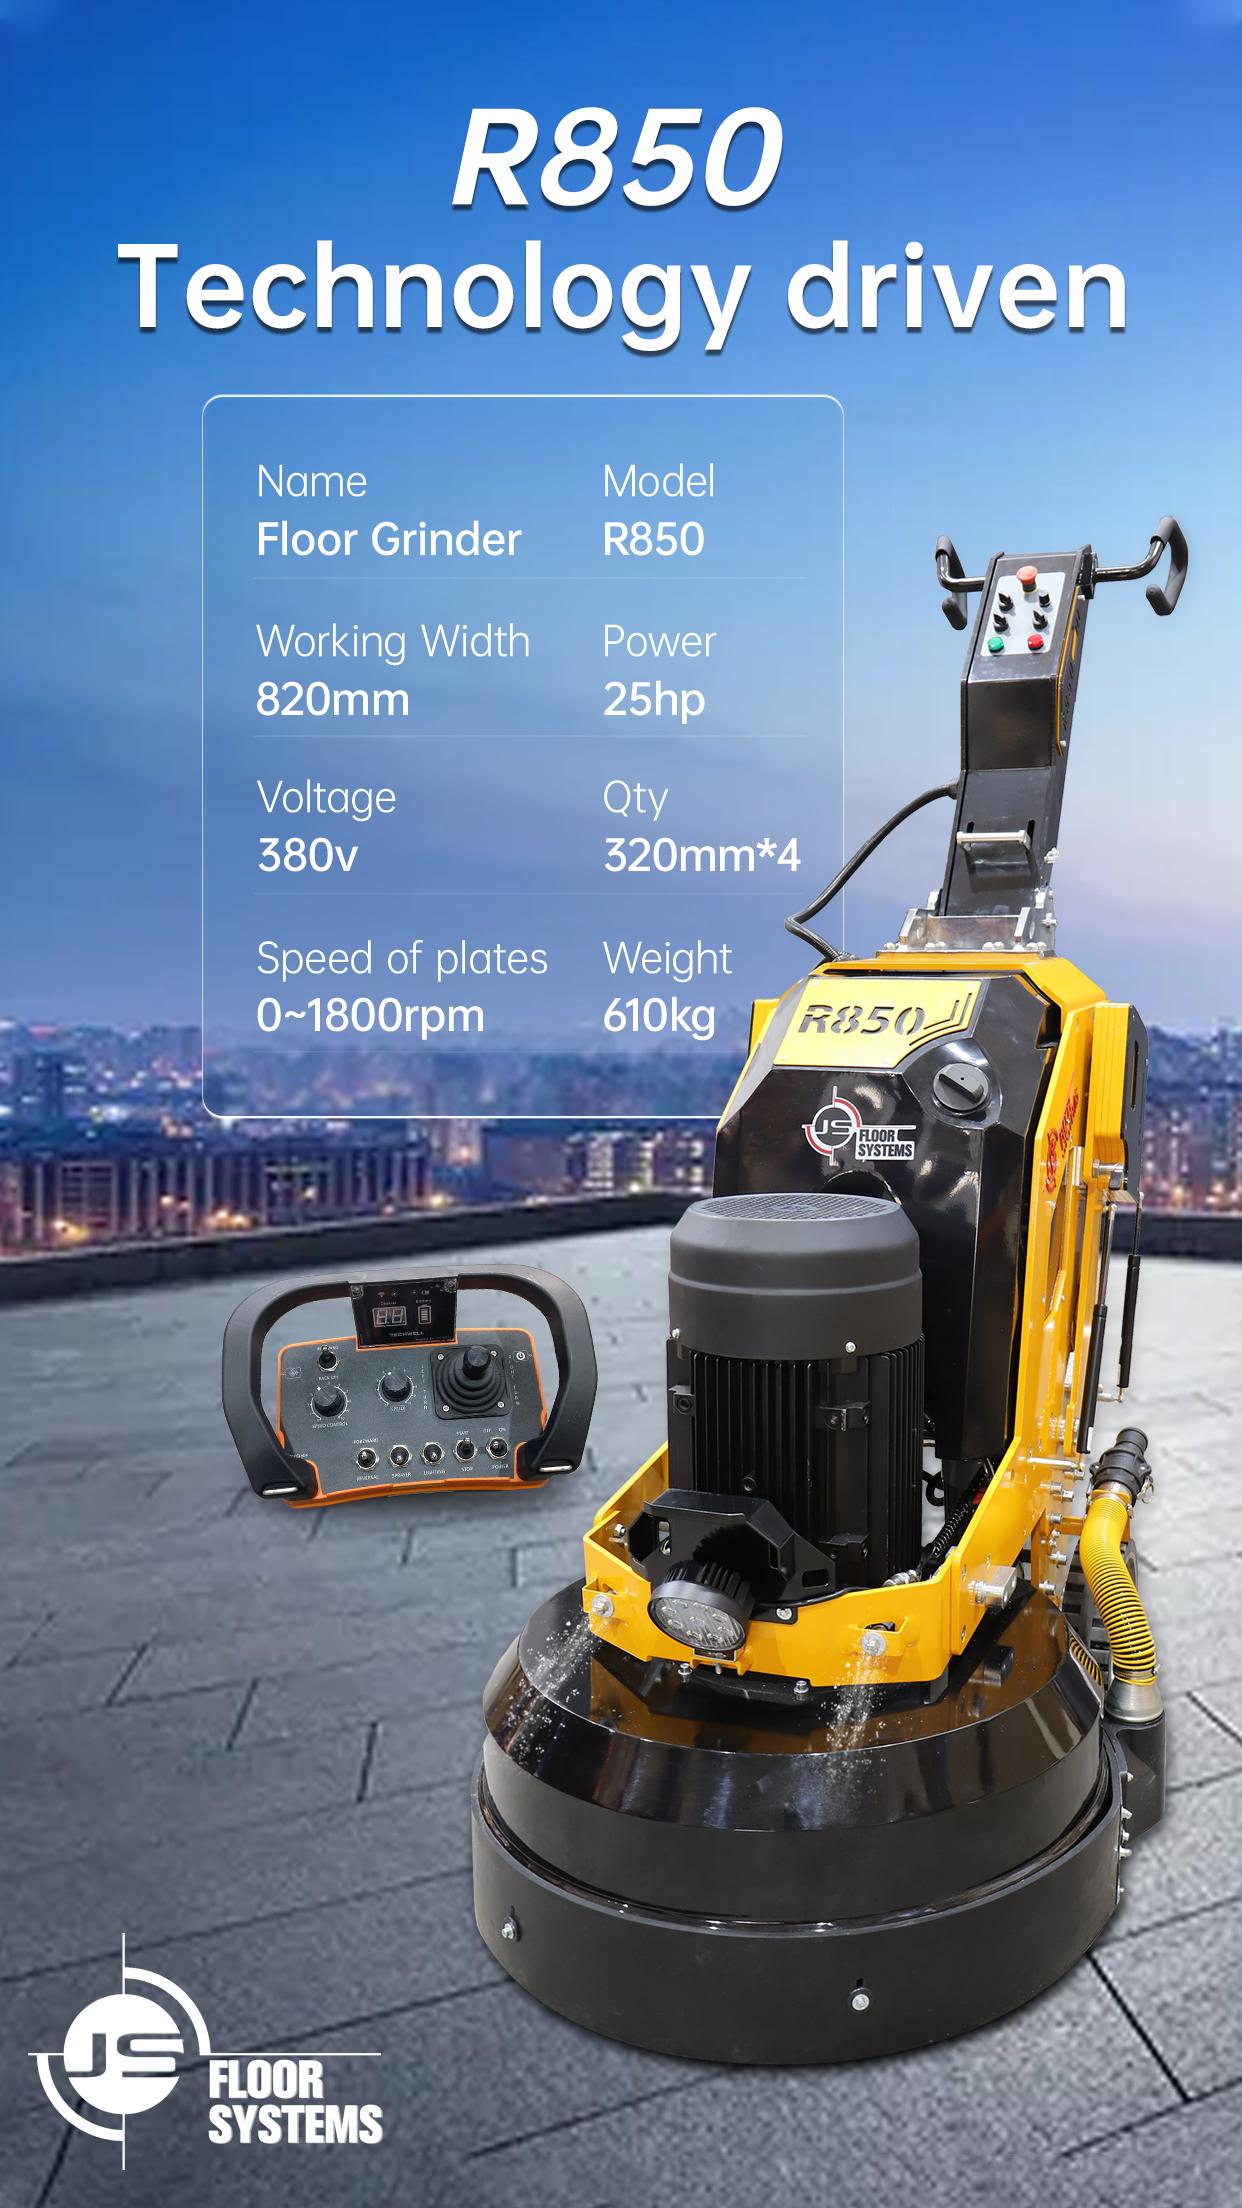 Floor Grinder R850